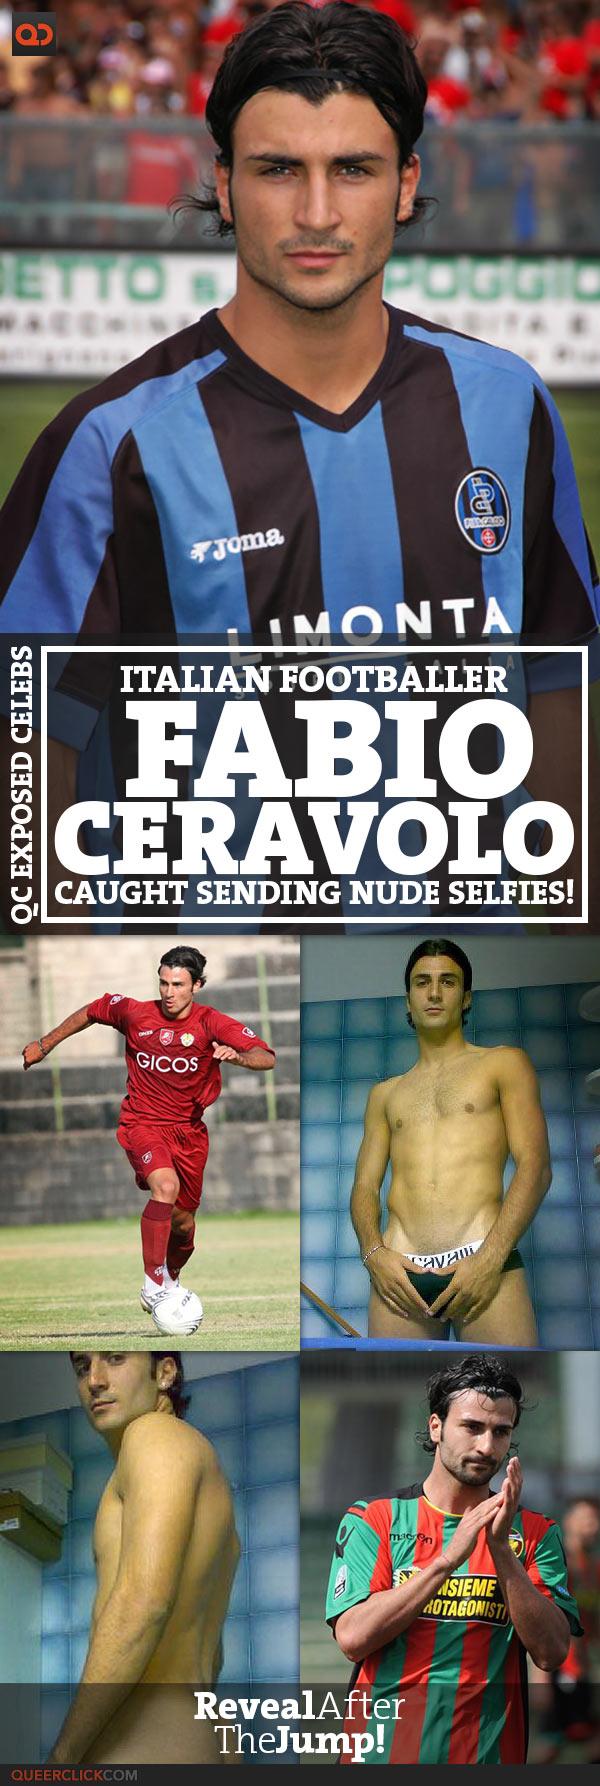 qc-exposed-celebs-fabio-ceravolo_caught_sending_nude_selfies-naked-in-bora_bora-teaser